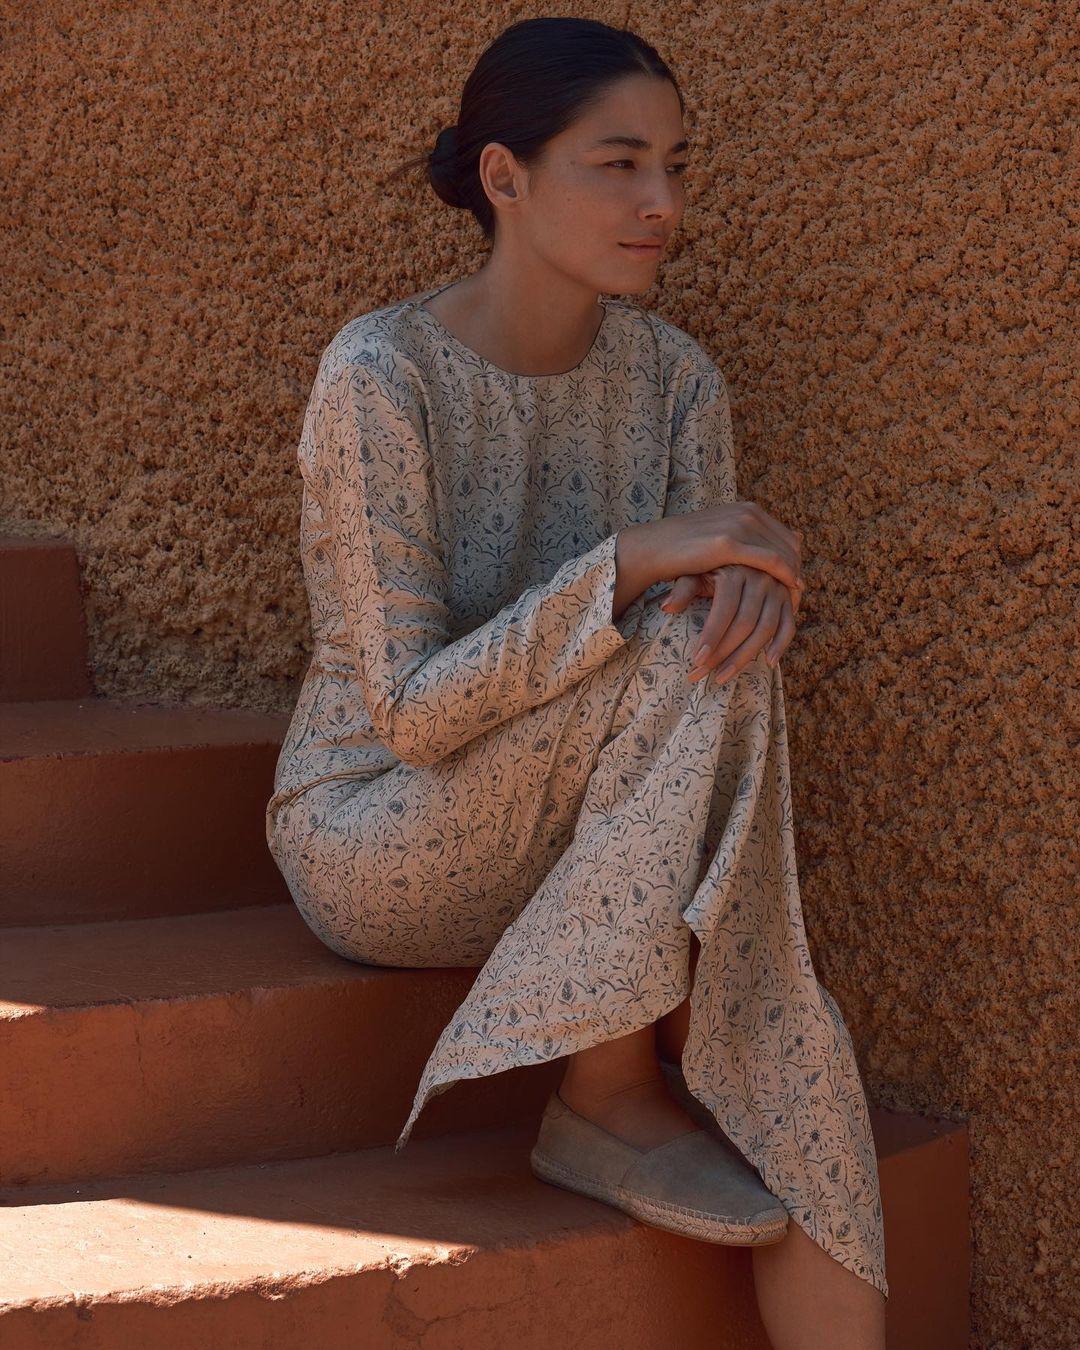 Jessica-Gomes-Wallpapers-Insta-Fit-Bio-3